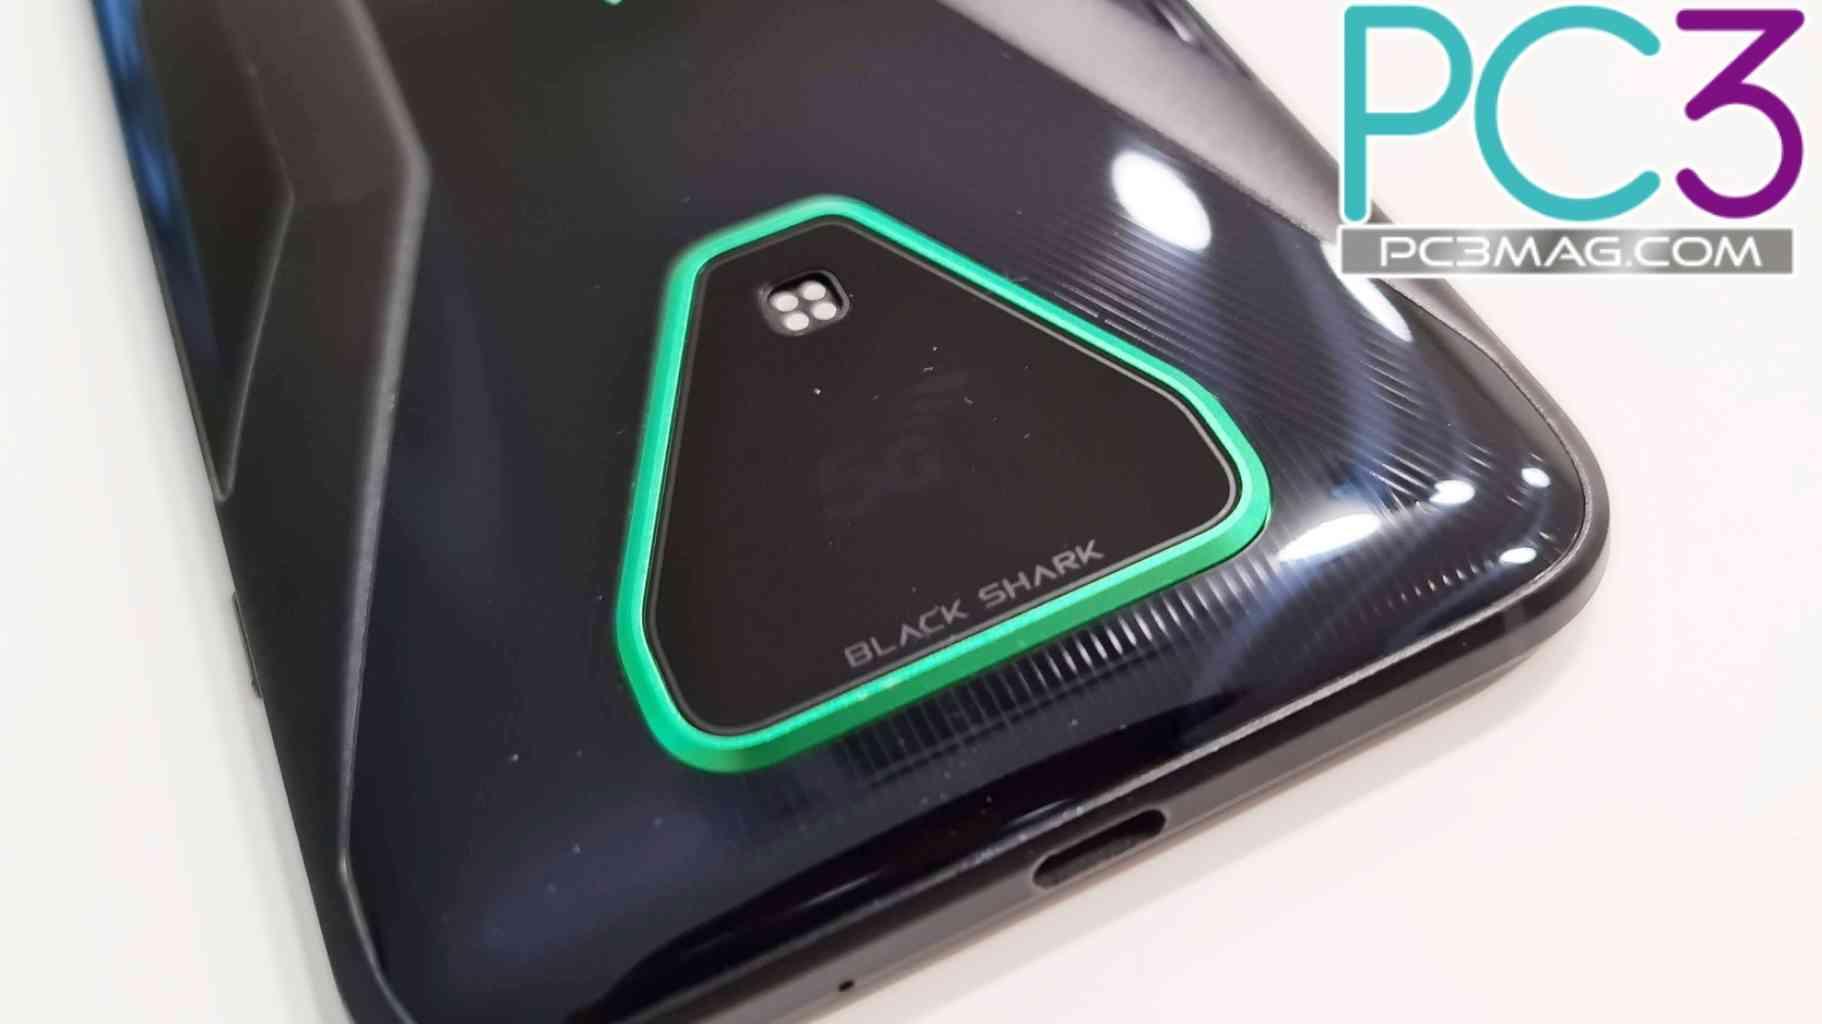 5G 黑鯊遊戲手機 3 抵港,HK$4,498 有得玩僅行貨支援 5G 網絡! - Yahoo奇摩時尚美妝